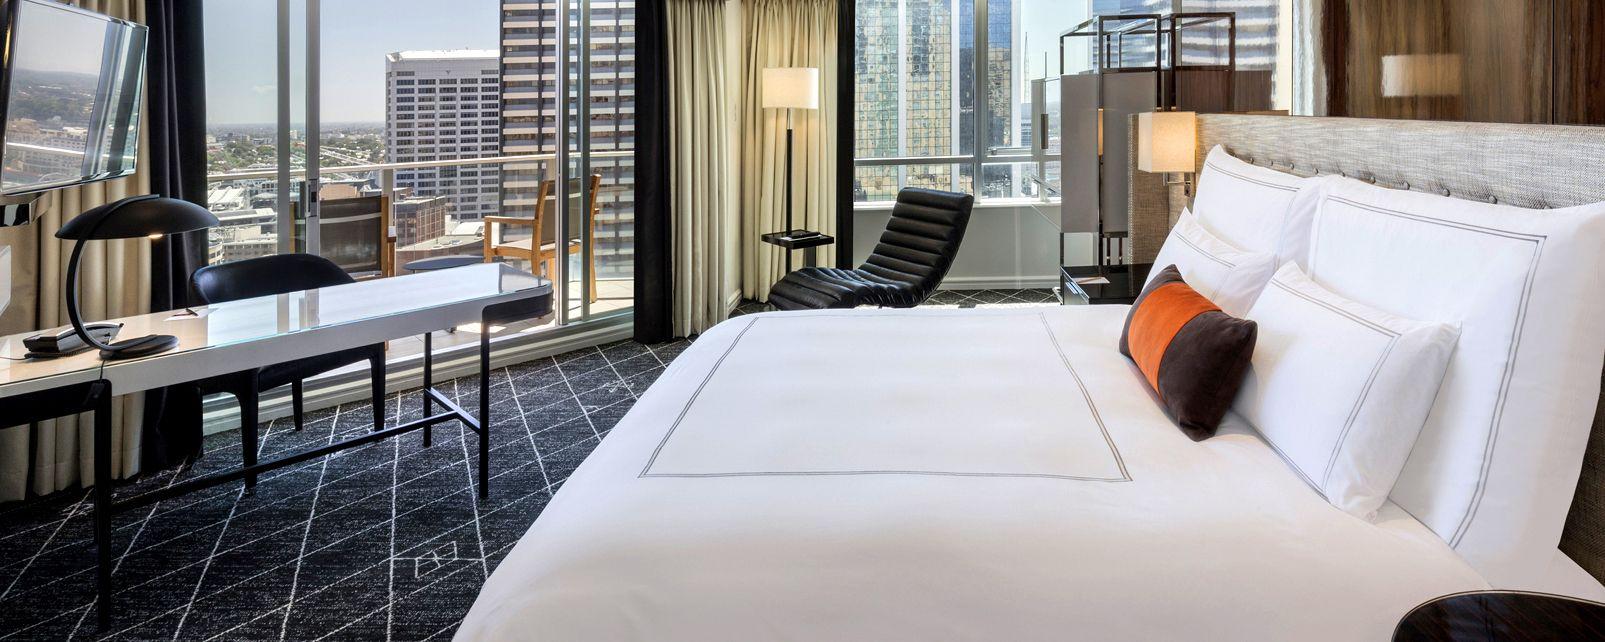 Hôtel Swissotel Sydney